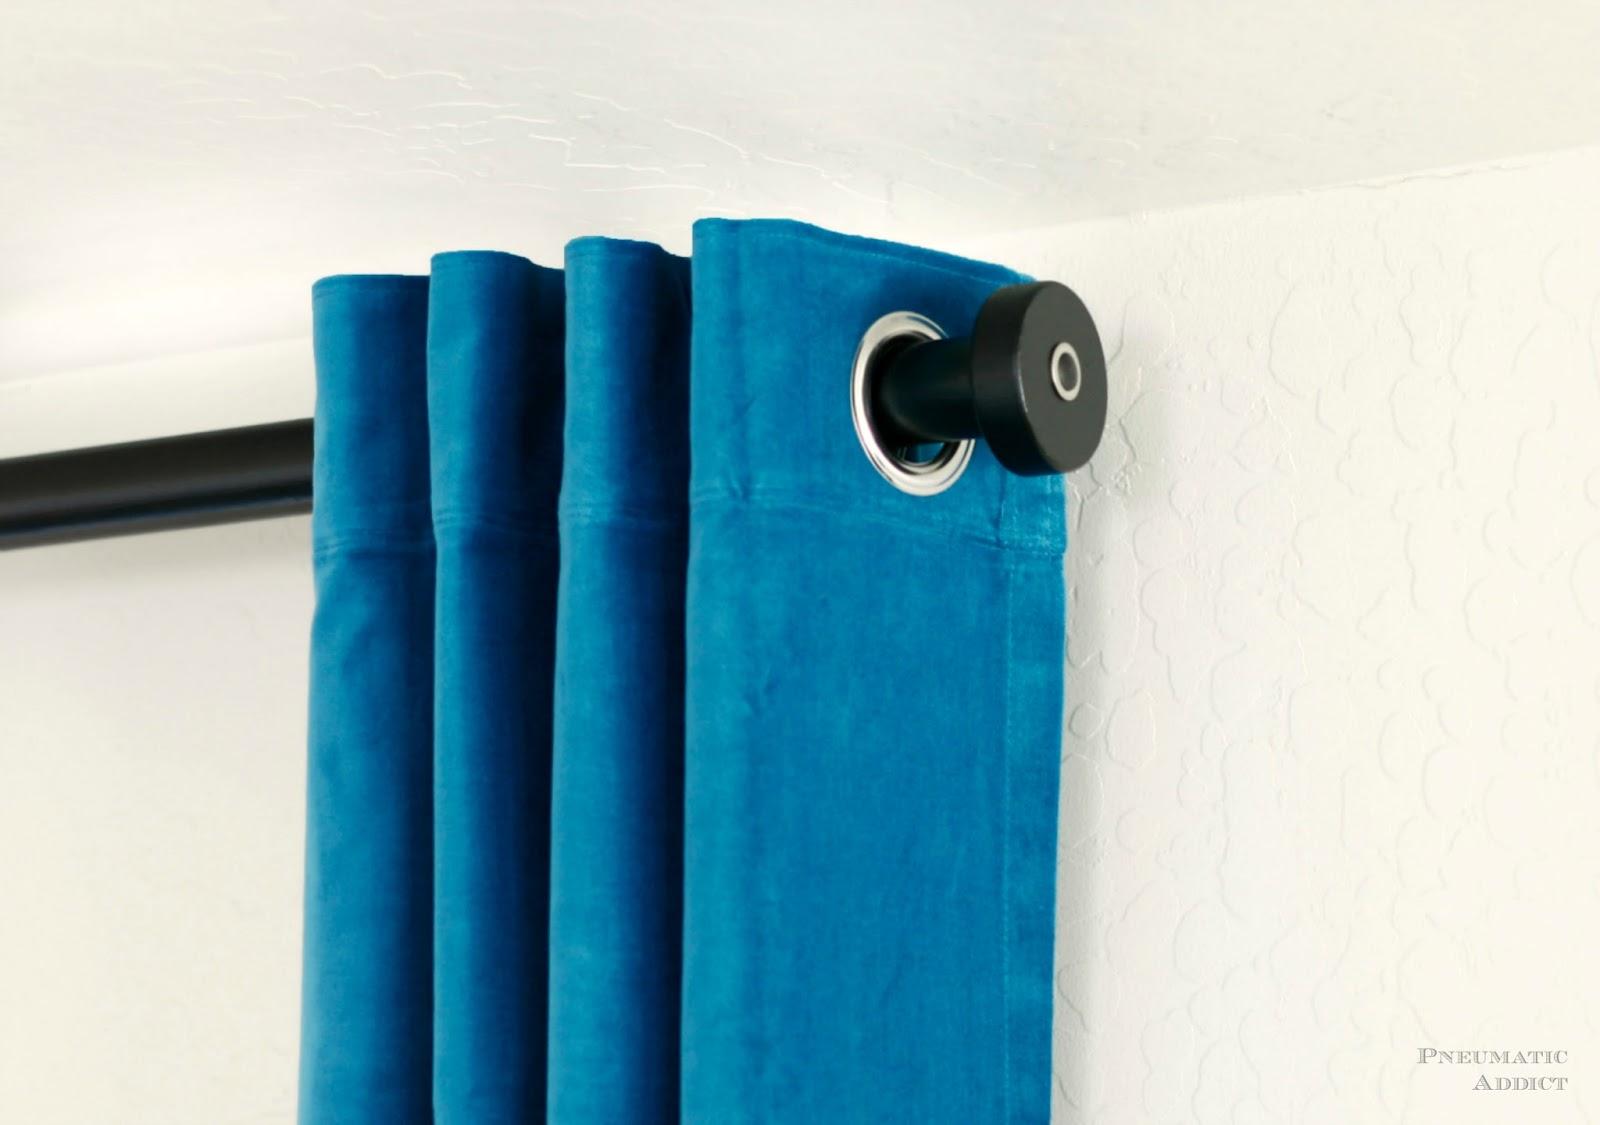 Bamboo curtain rods diy - Pneumatic Addict Modern Curtain Rod And Finial Tutorial